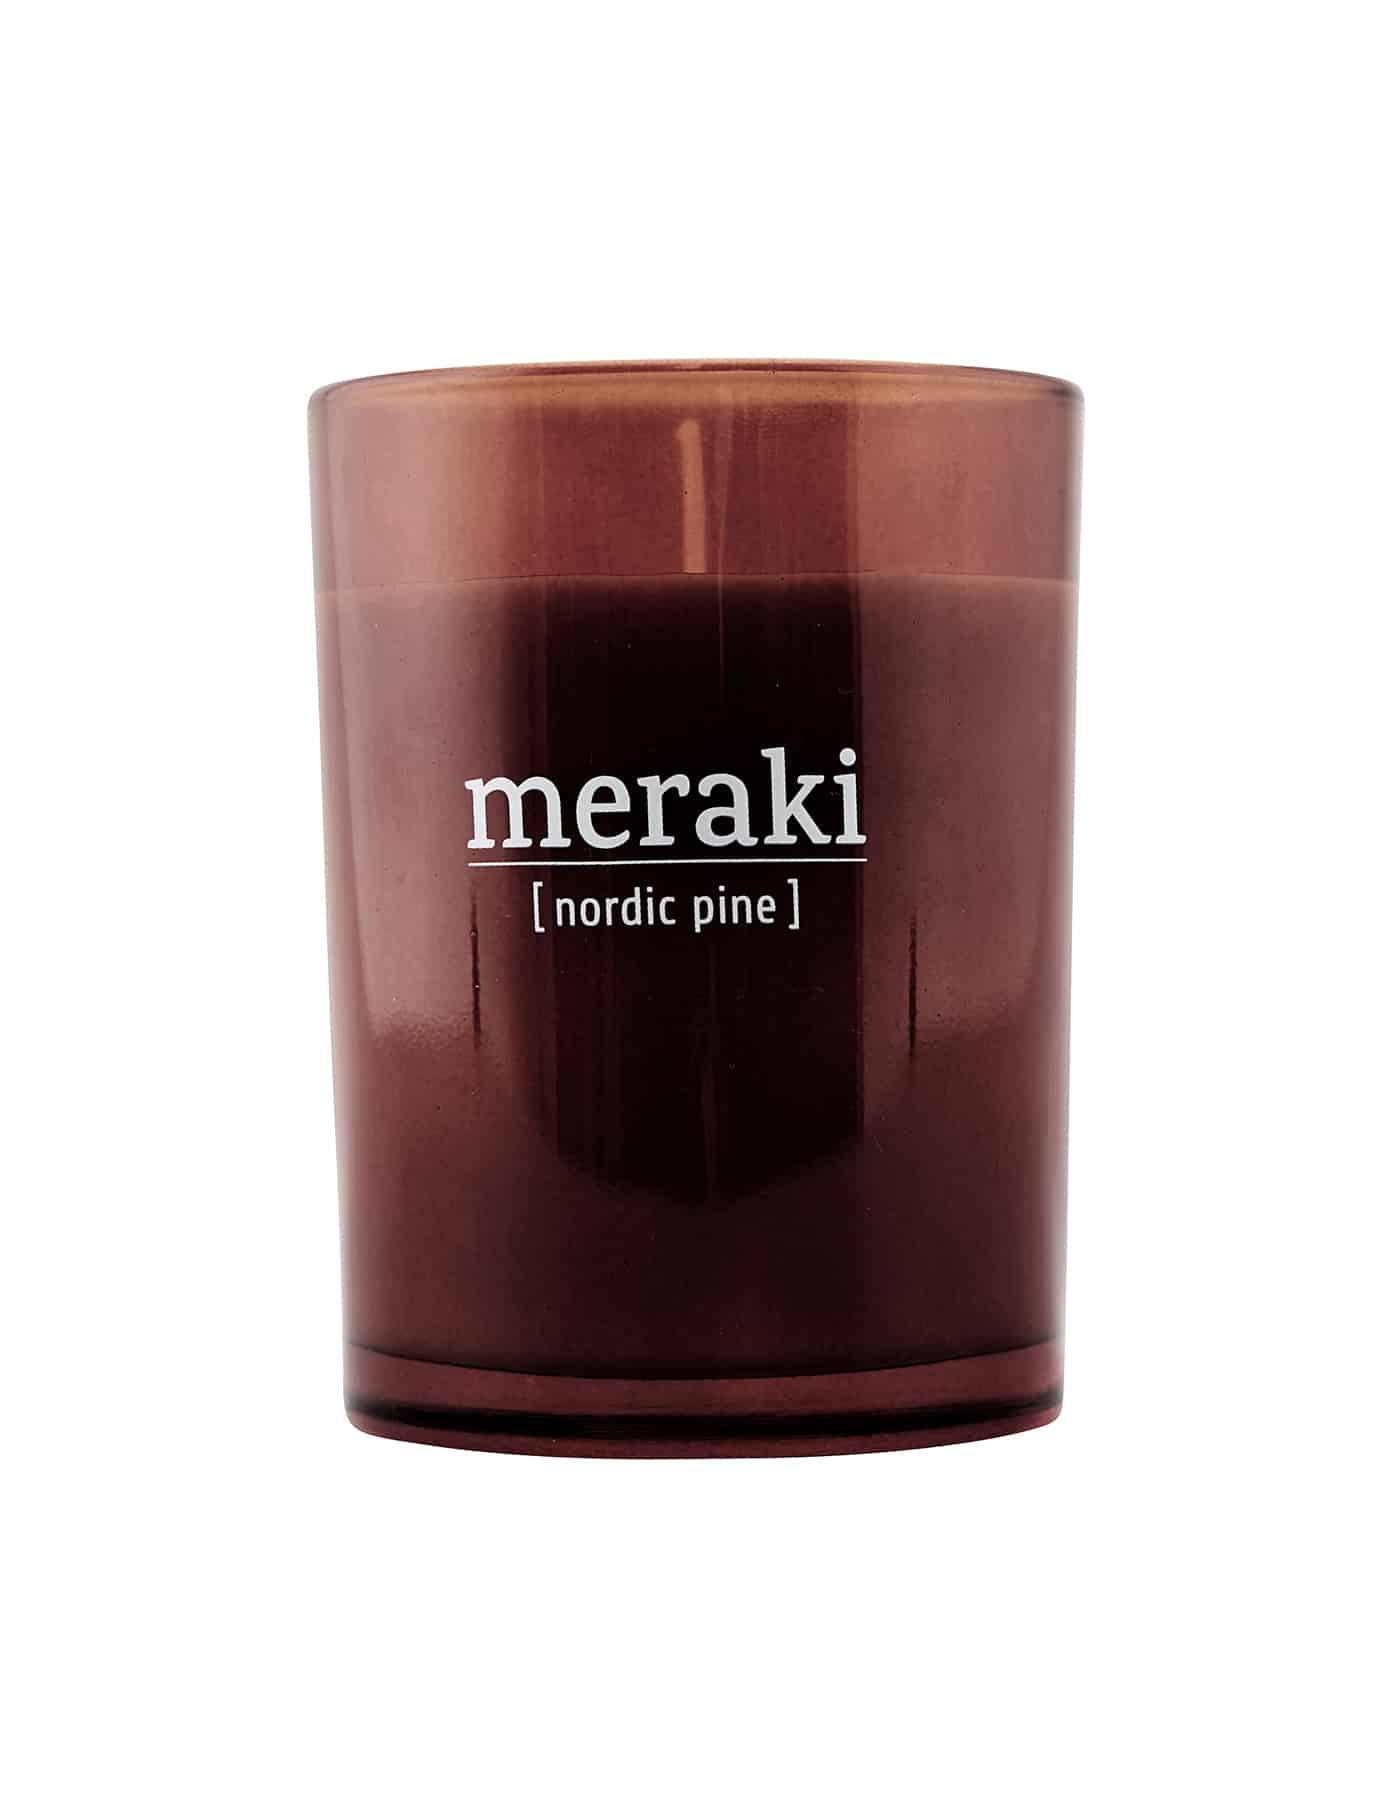 Meraki Scented Candle, Nordic Pine